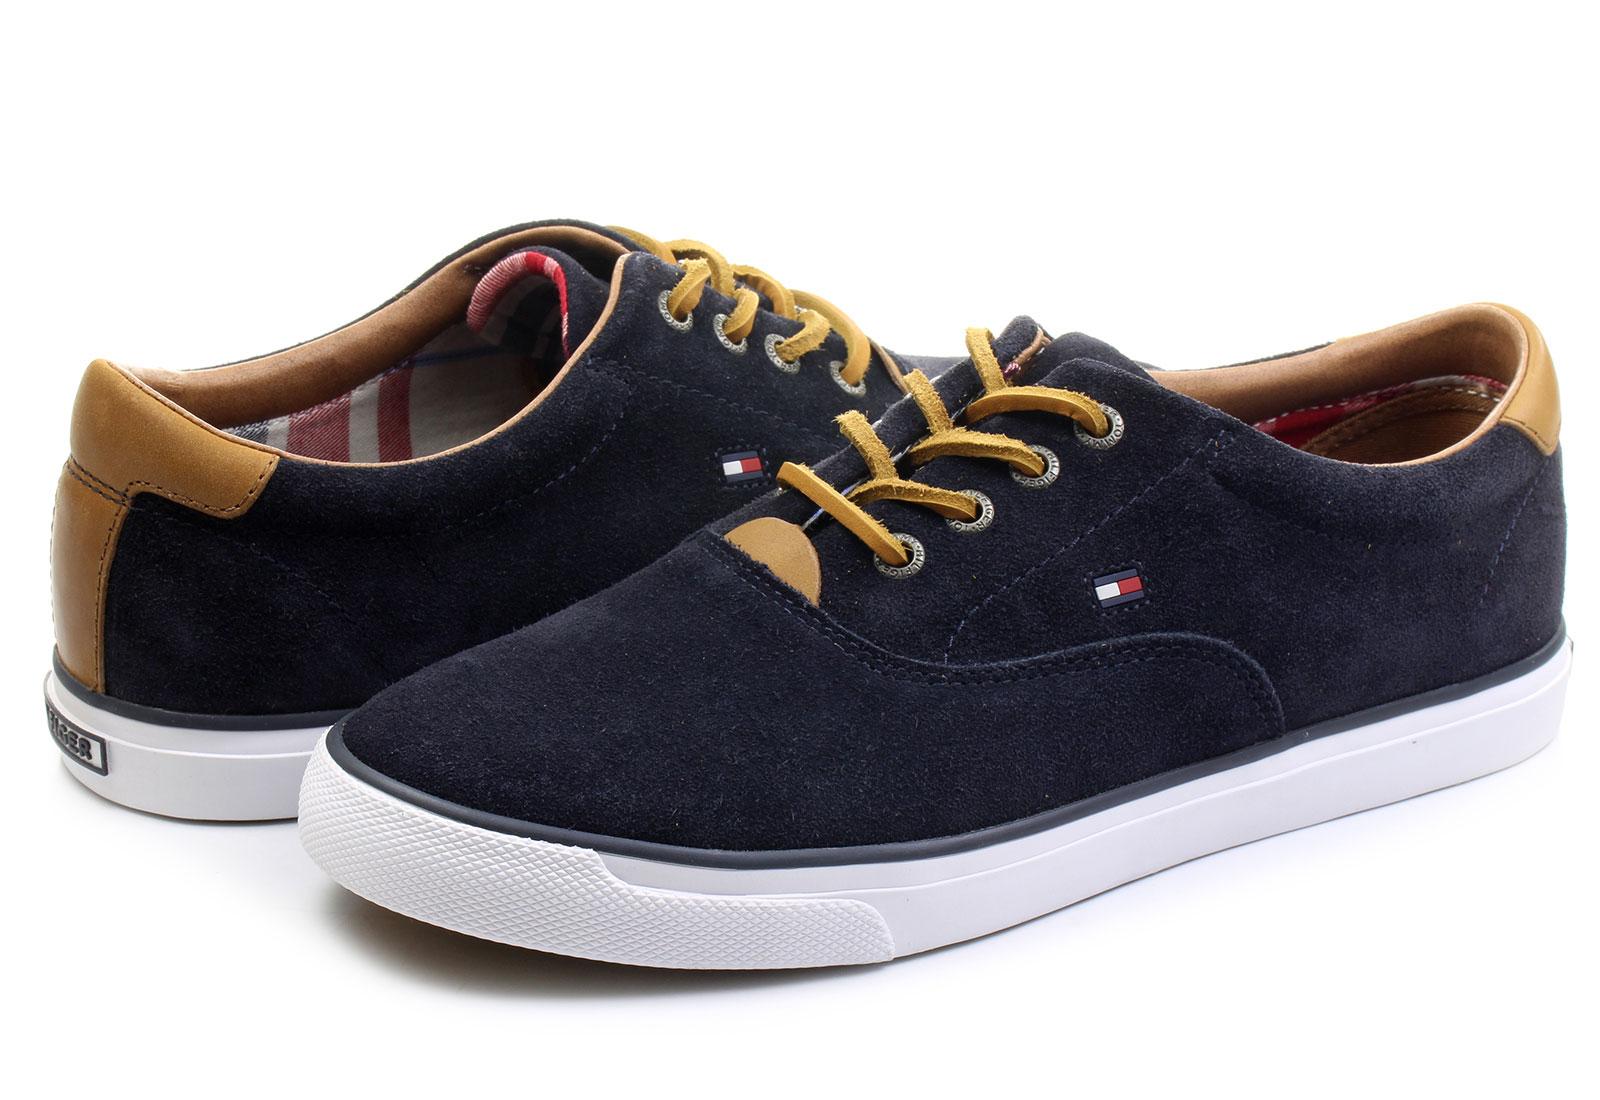 Tommy Hilfiger Cipő - Wilkes 2b - 16S-1106-403 - Office Shoes ... 1a275c4655